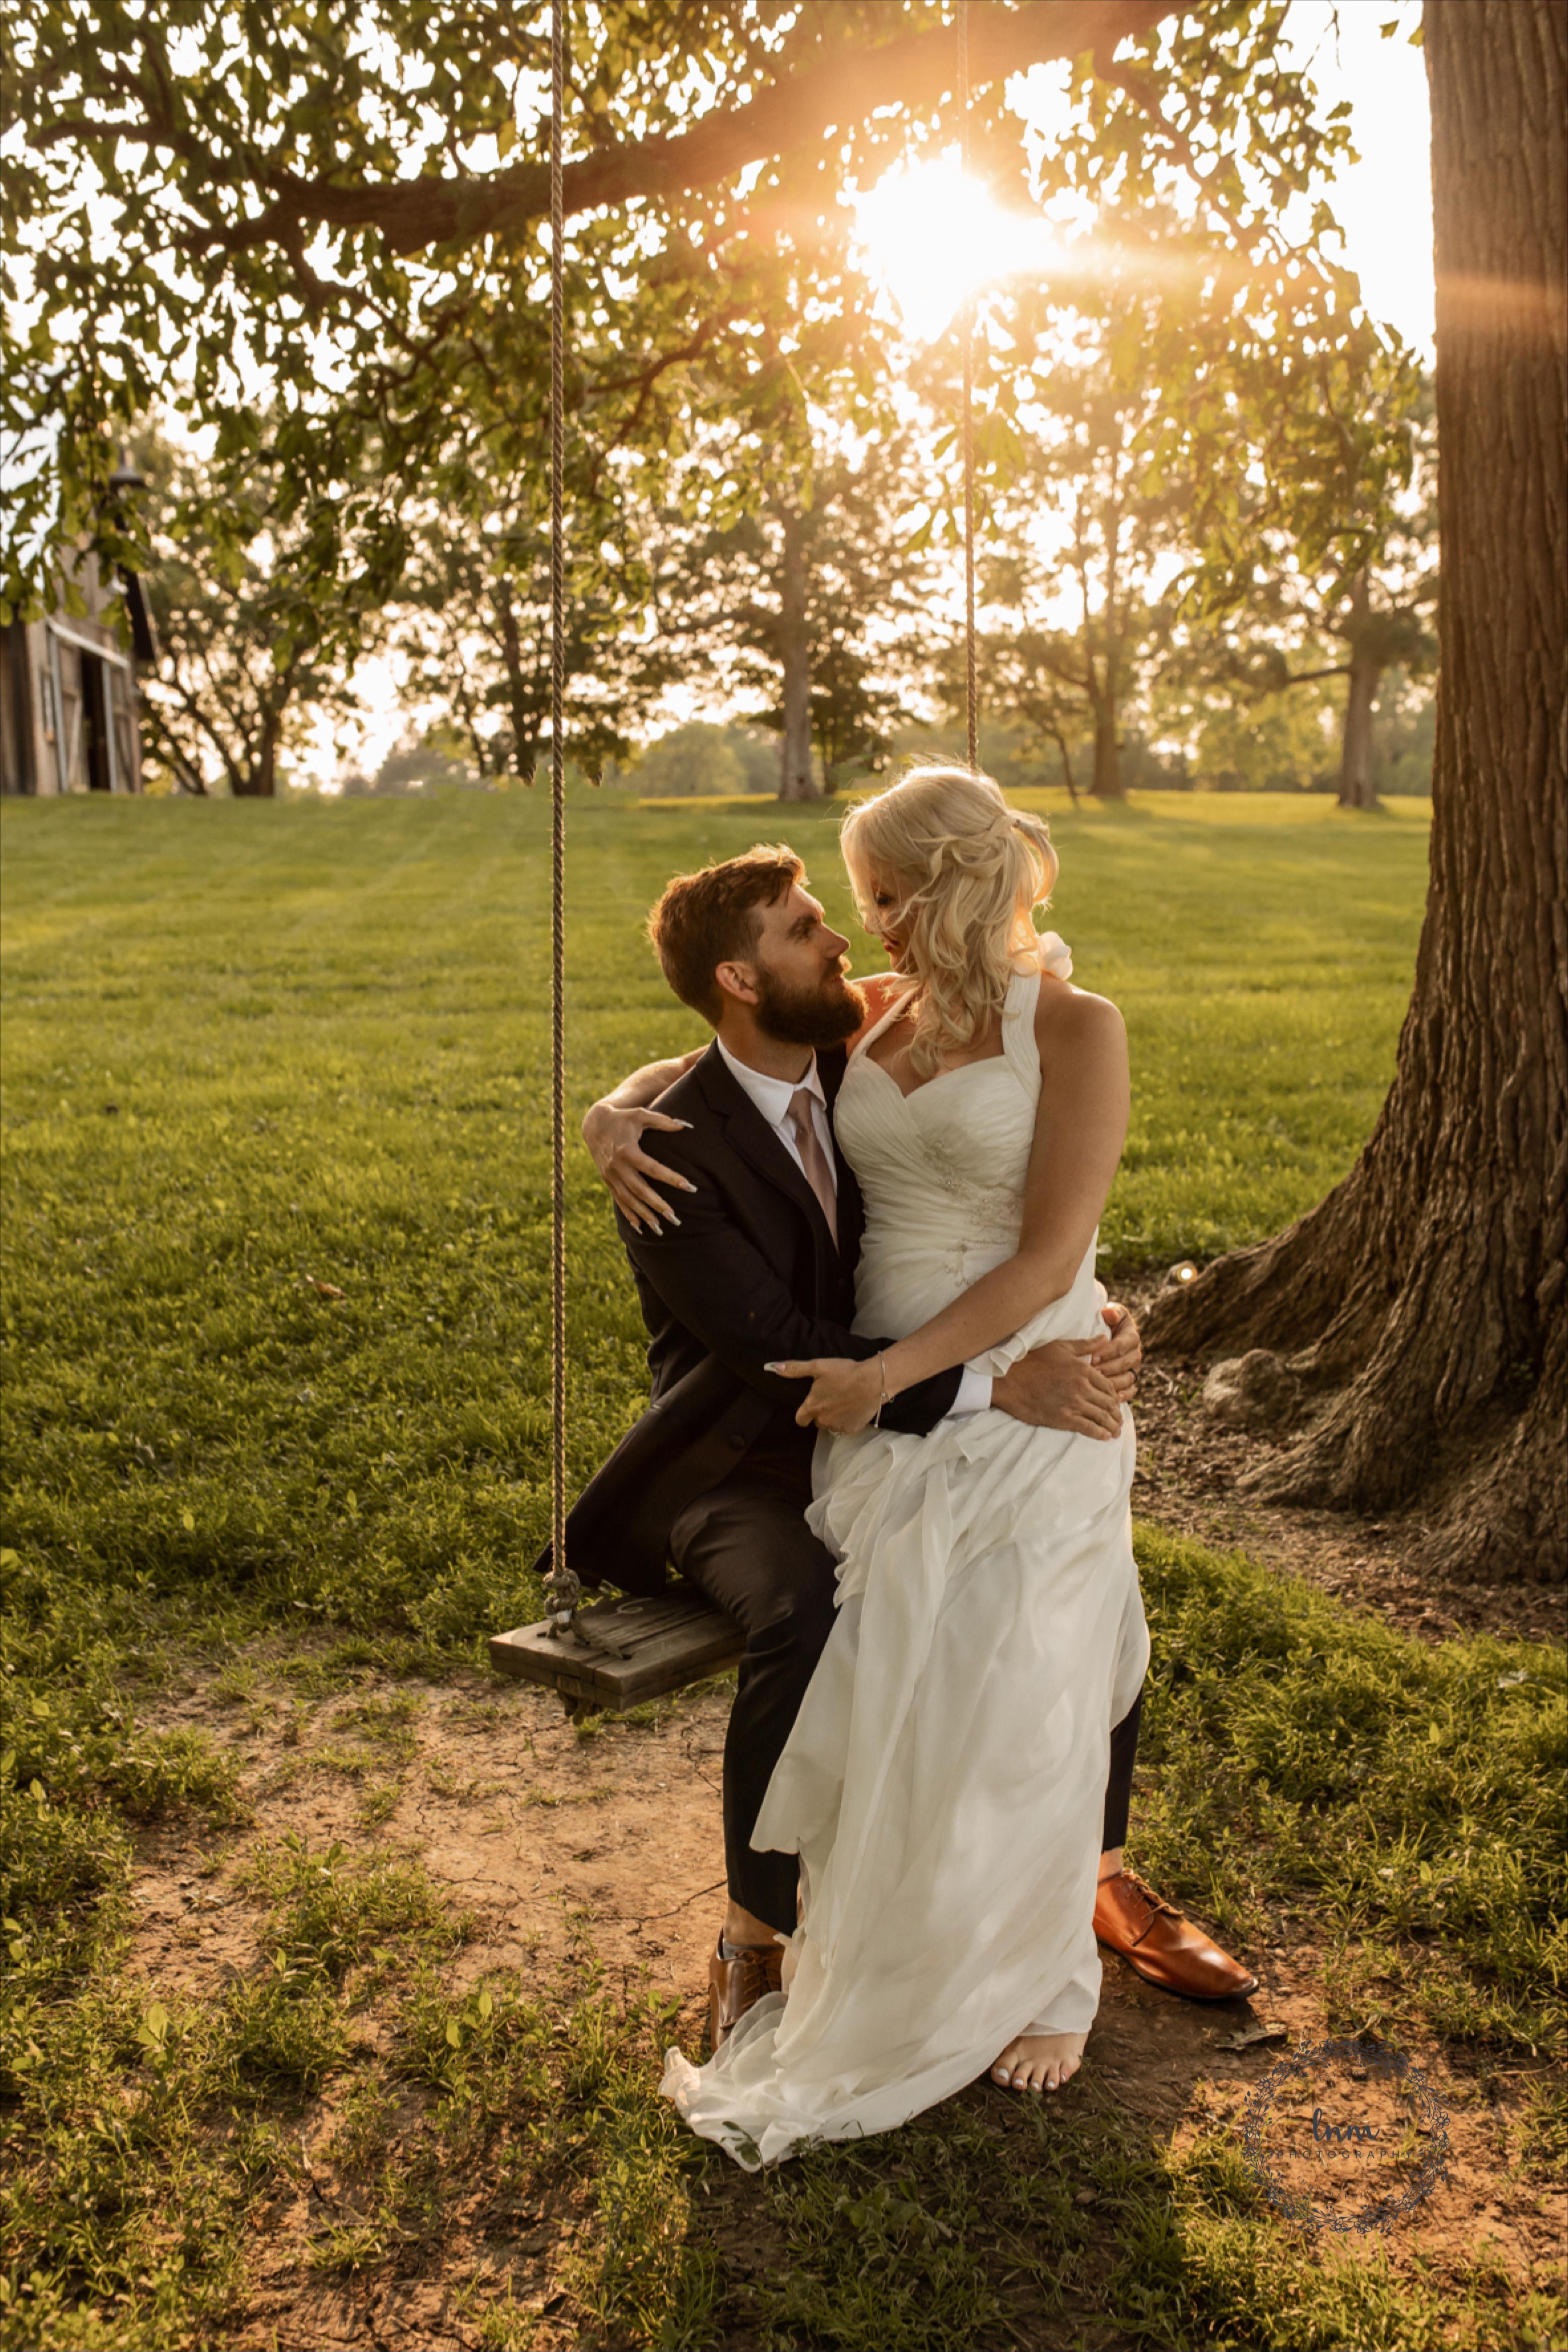 The Barn at Kennedy Farm Wedding - LNM Photography in 2020 ...